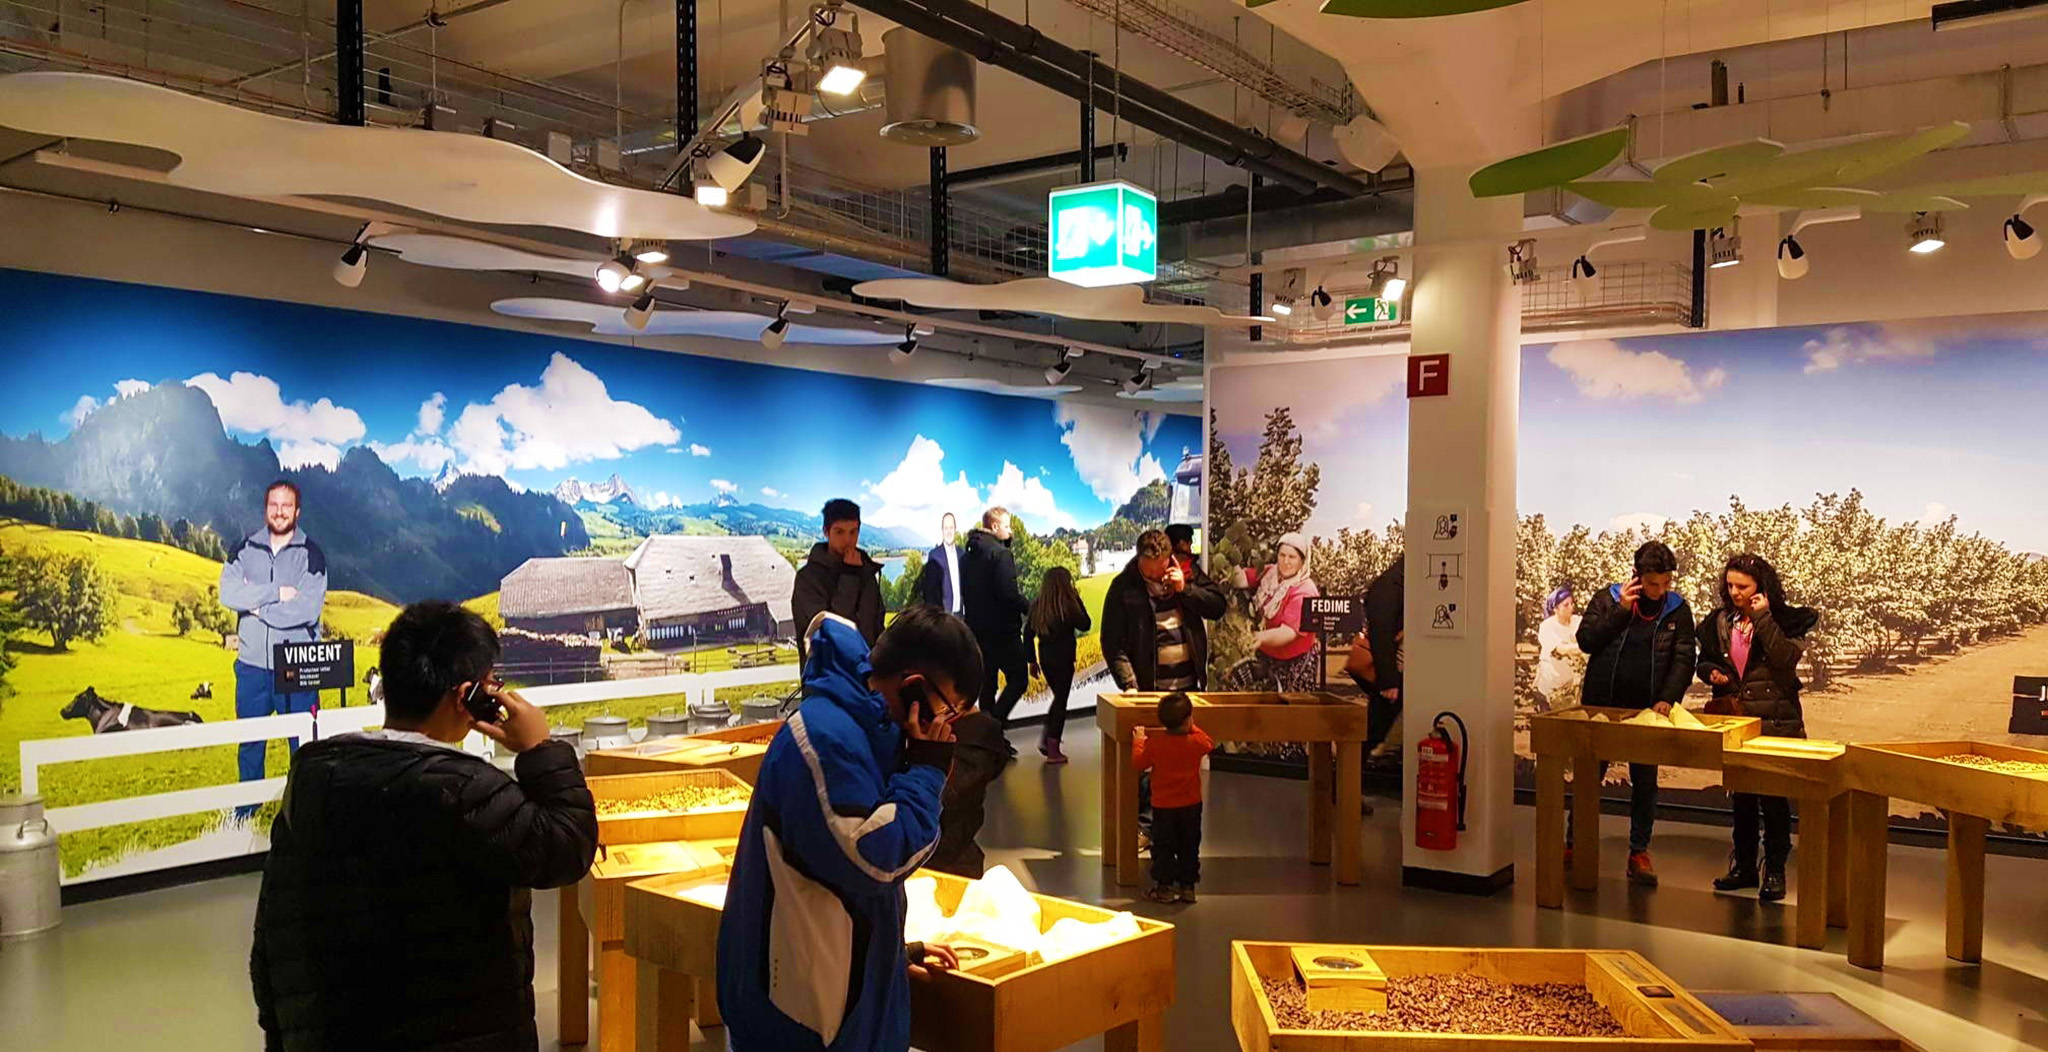 kt_2020_350_Keytours_excursions_Swisstours_gruyères_maison_cailler3_2048_10